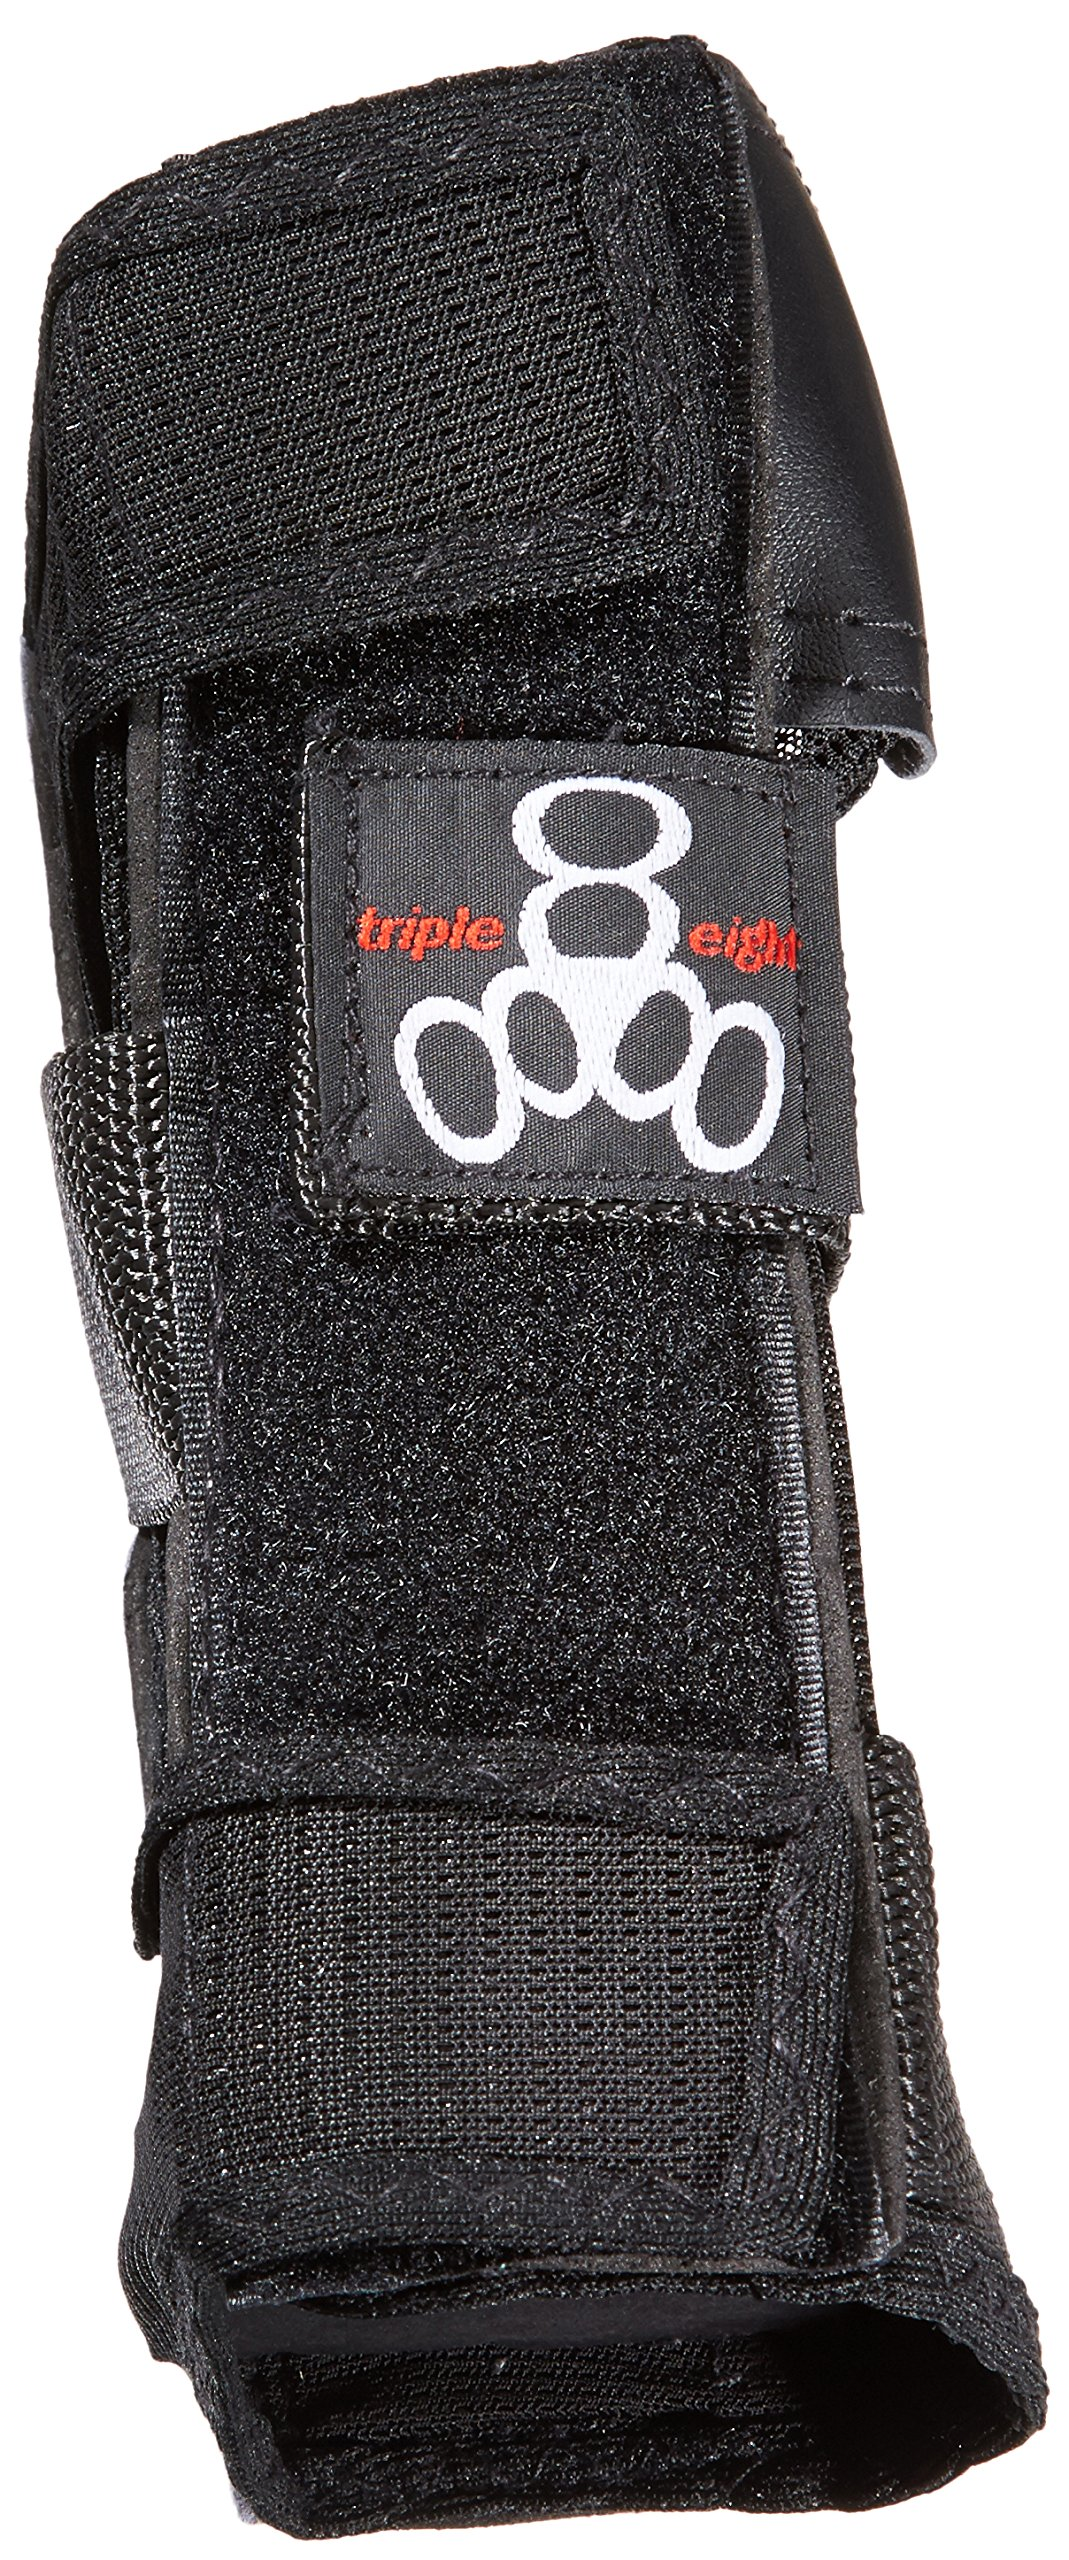 Triple 8 Saver Series Wristsavers (Black, Large) by Triple Eight